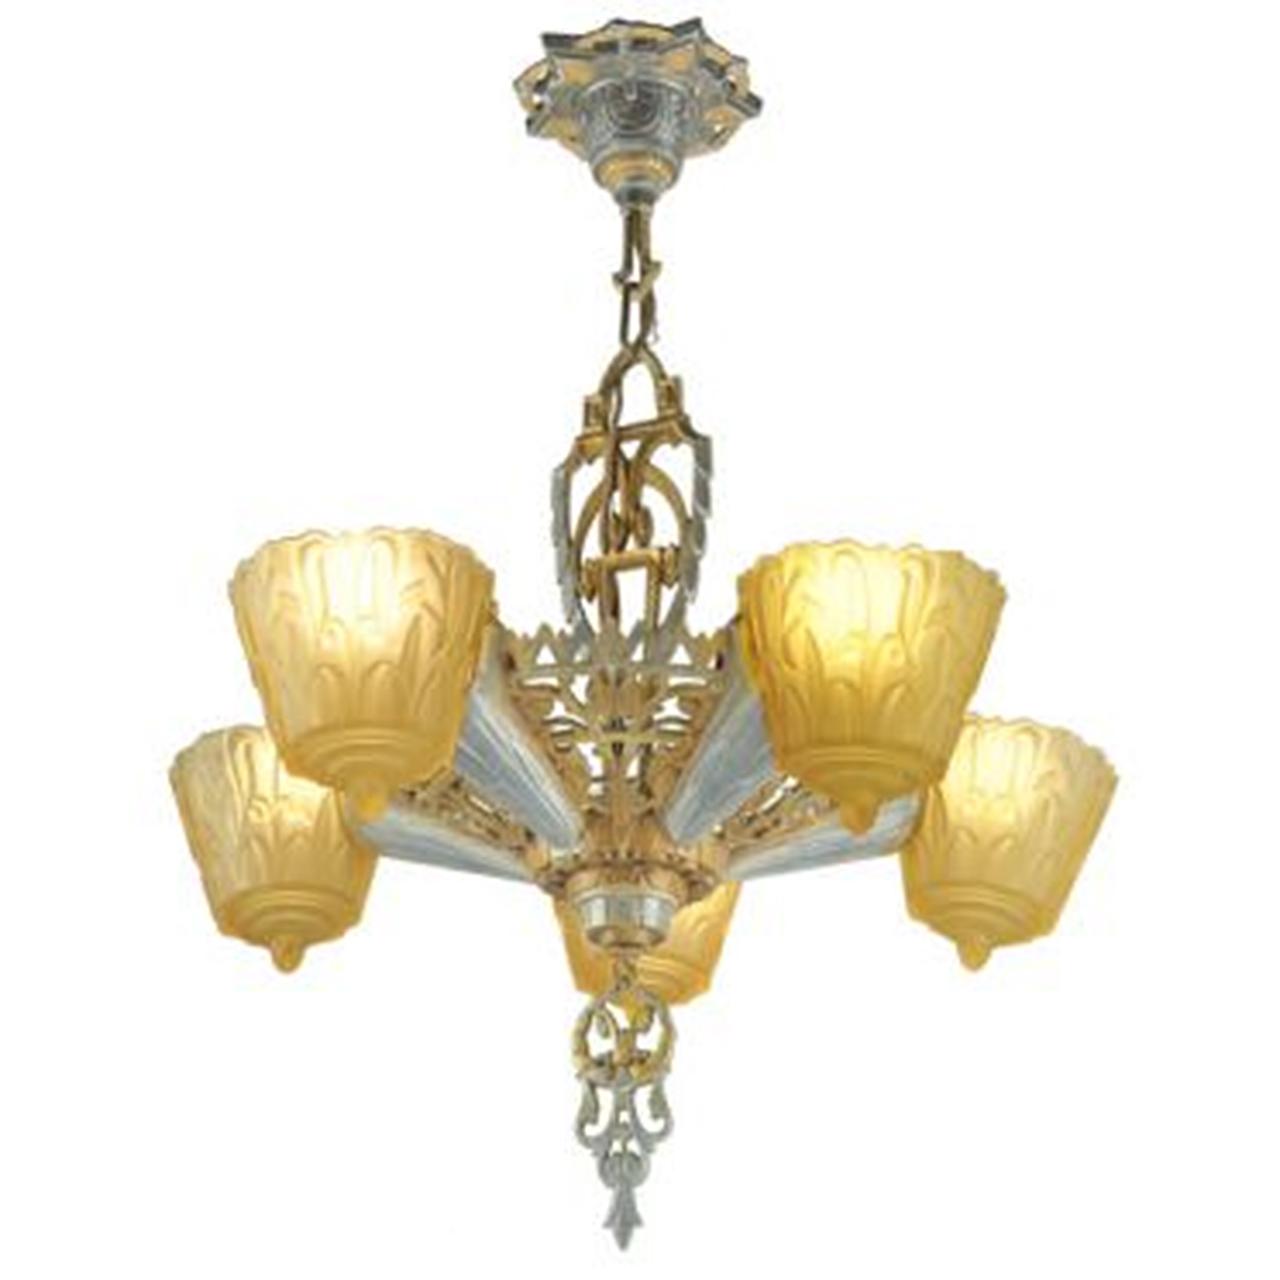 Antique art deco slip shade 1930s nile chandelier by lincoln mnf antique art deco slip shade 1930s nile chandelier by lincoln mnf ant 429 for sale arubaitofo Gallery